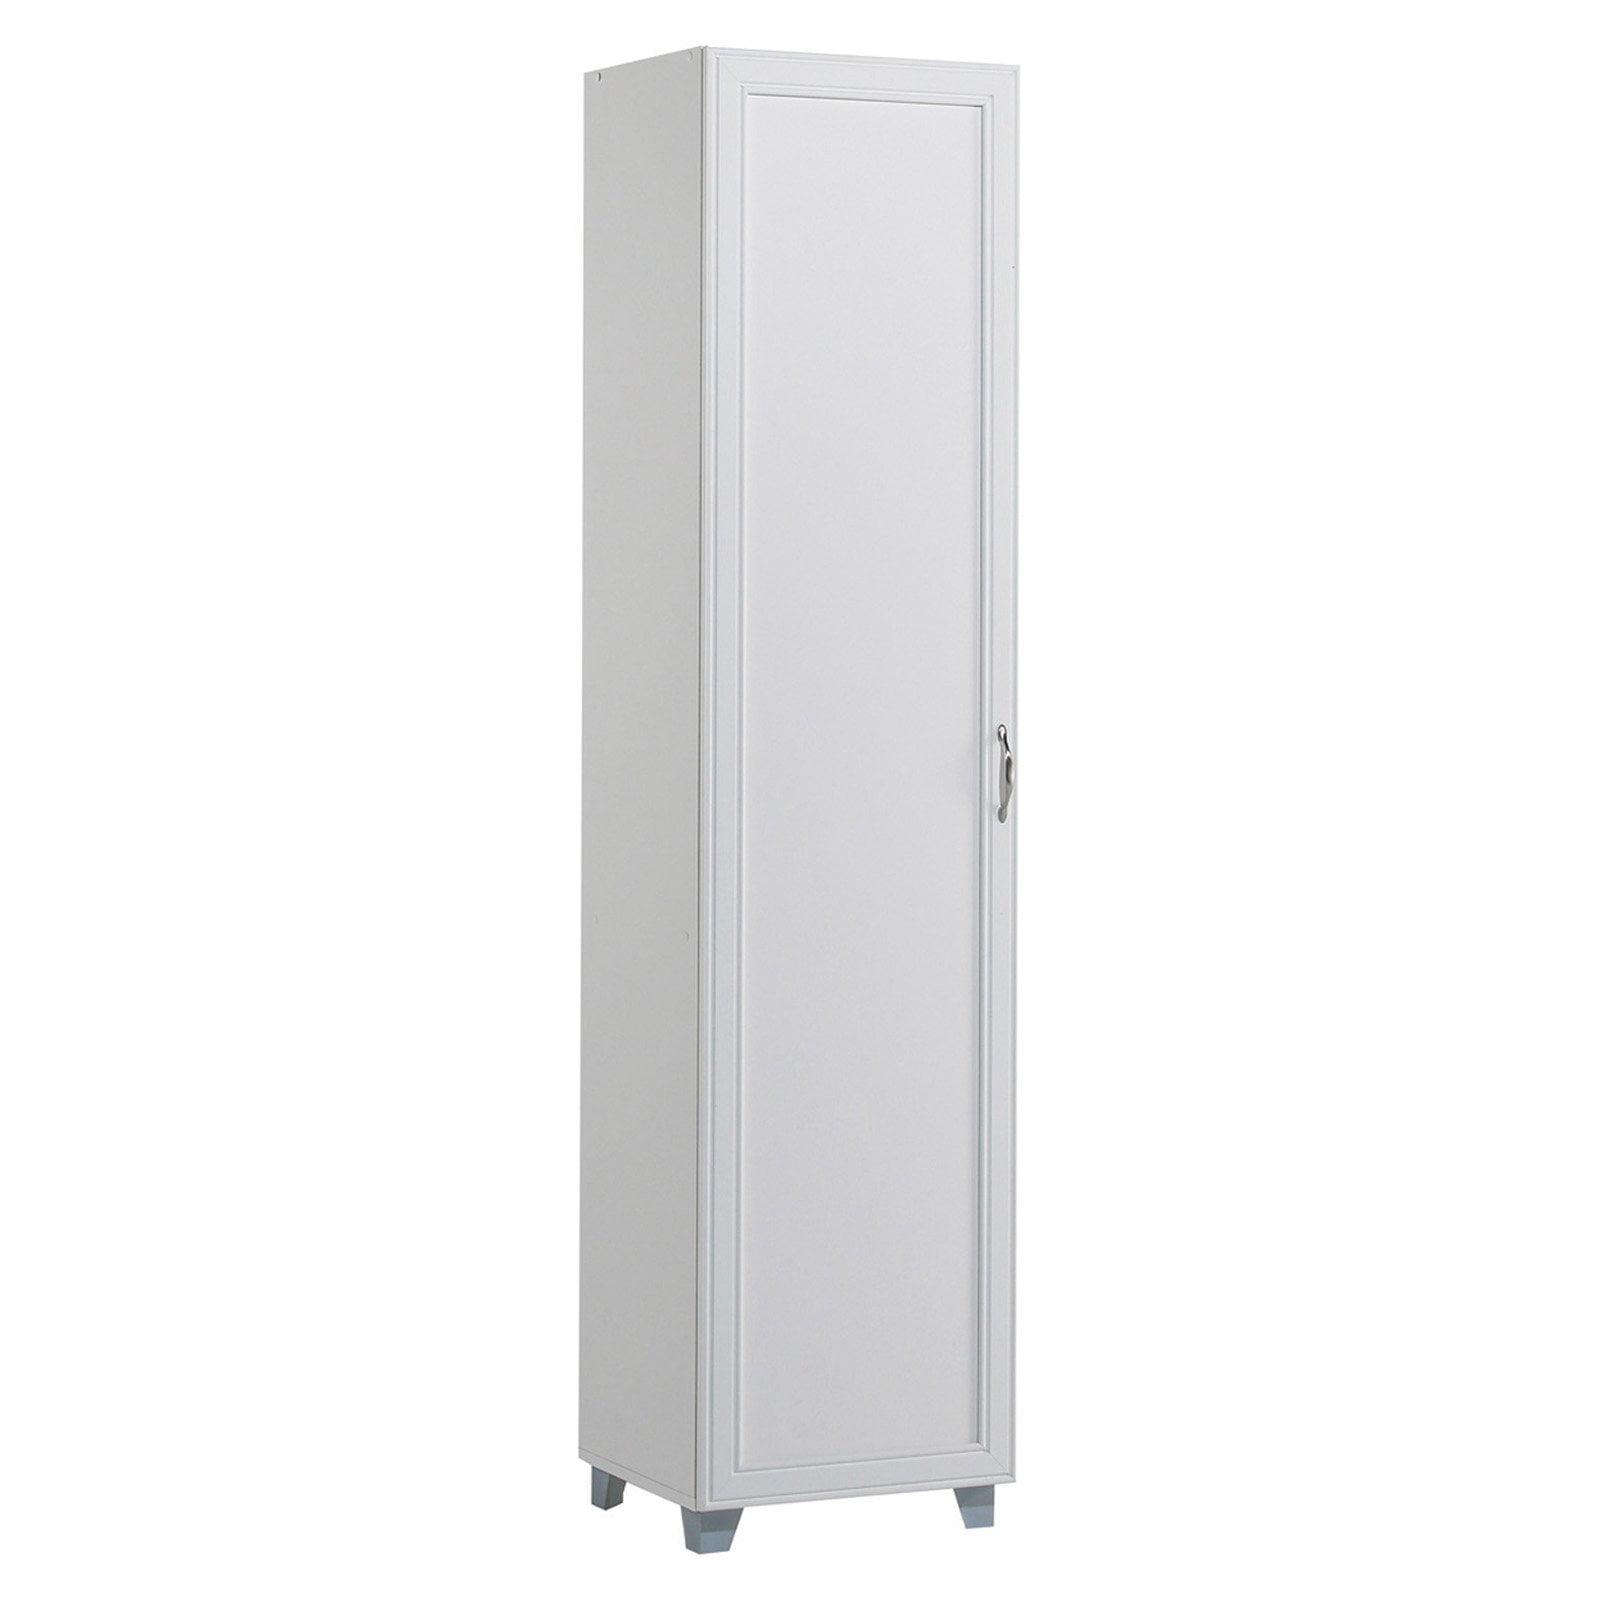 akadaHOME Tall Single Door Storage Cabinet - White